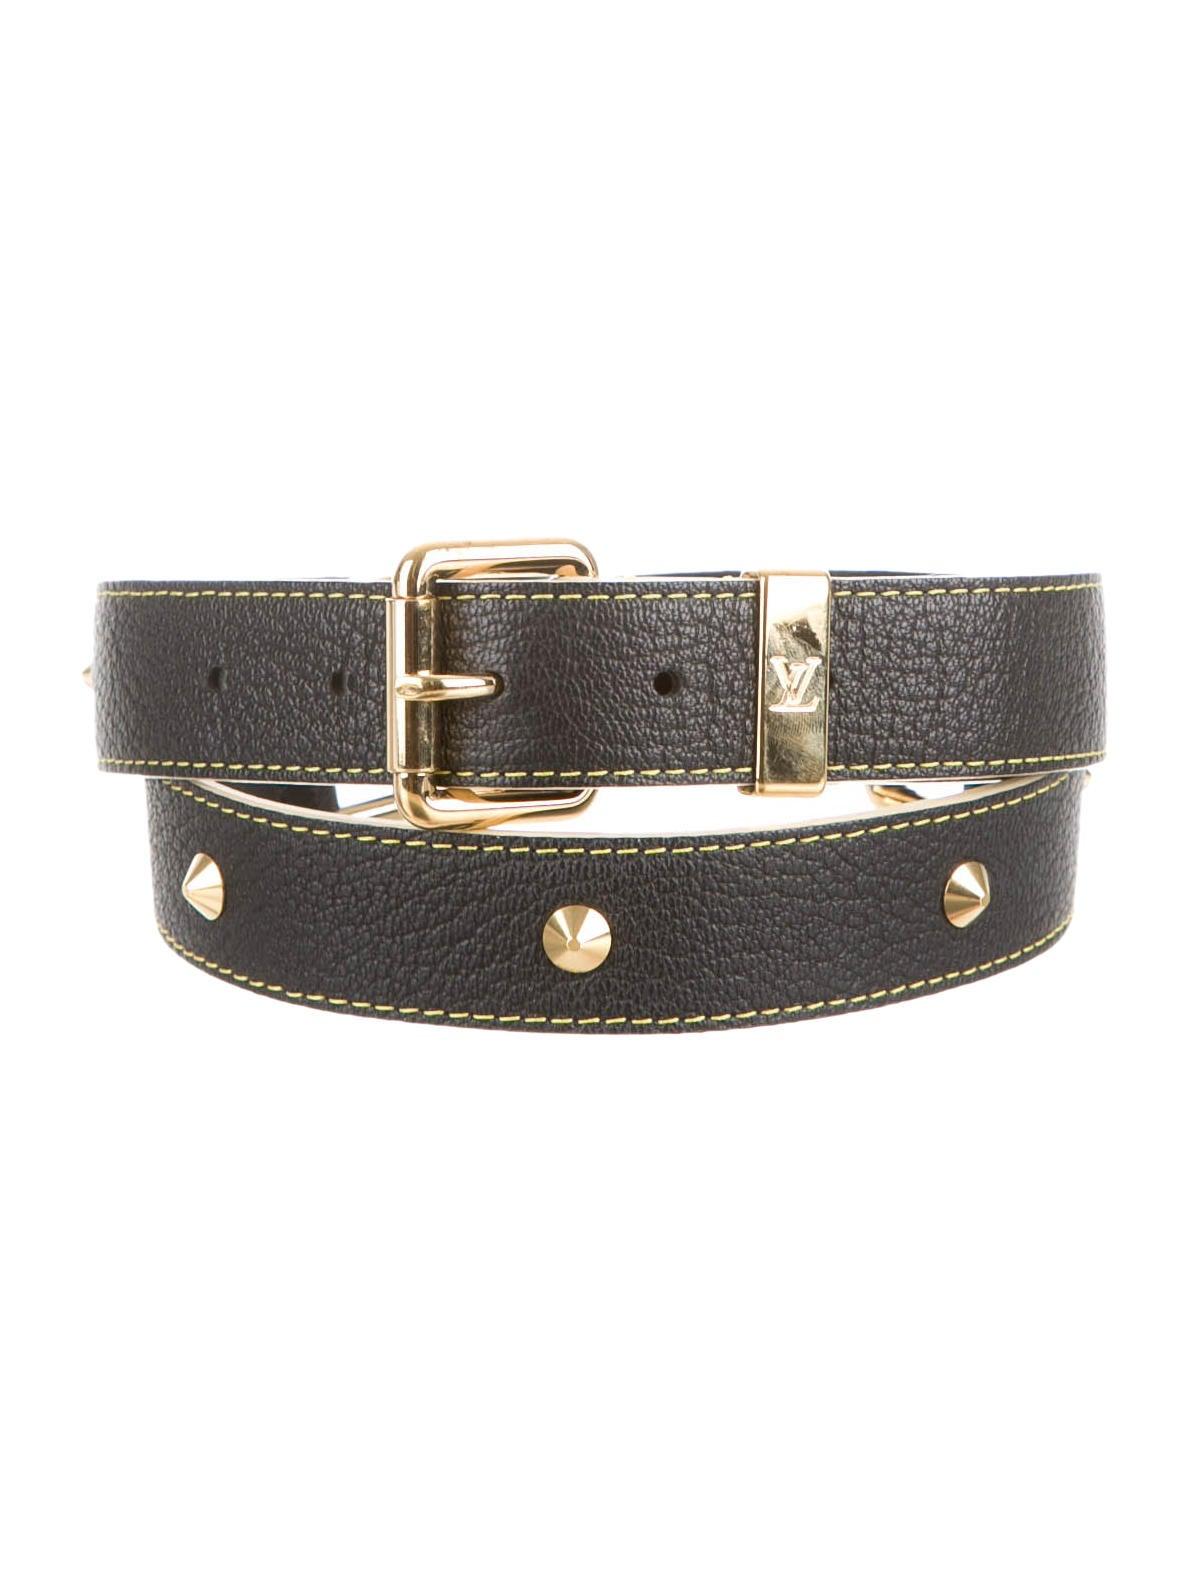 Louis Vuitton Suhali Belt - Accessories - LOU57111   The RealReal  Louis Vuitton S...